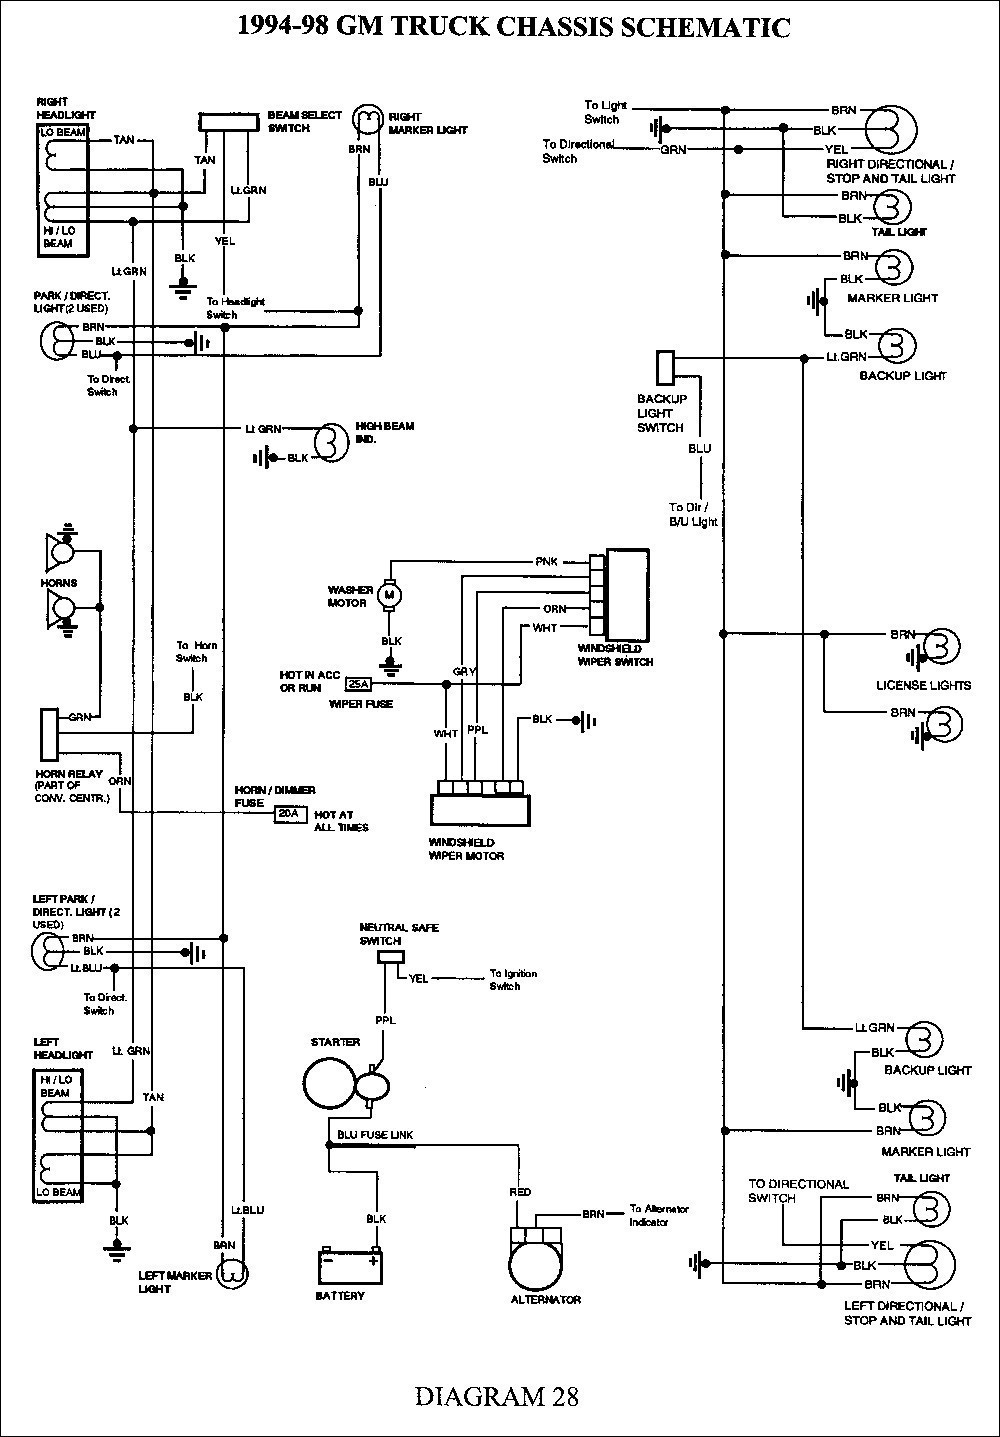 Chevy Backup Light Wiring Diagram Wiring Diagram Used 2005 Dodge Ram Backup Light Wiring